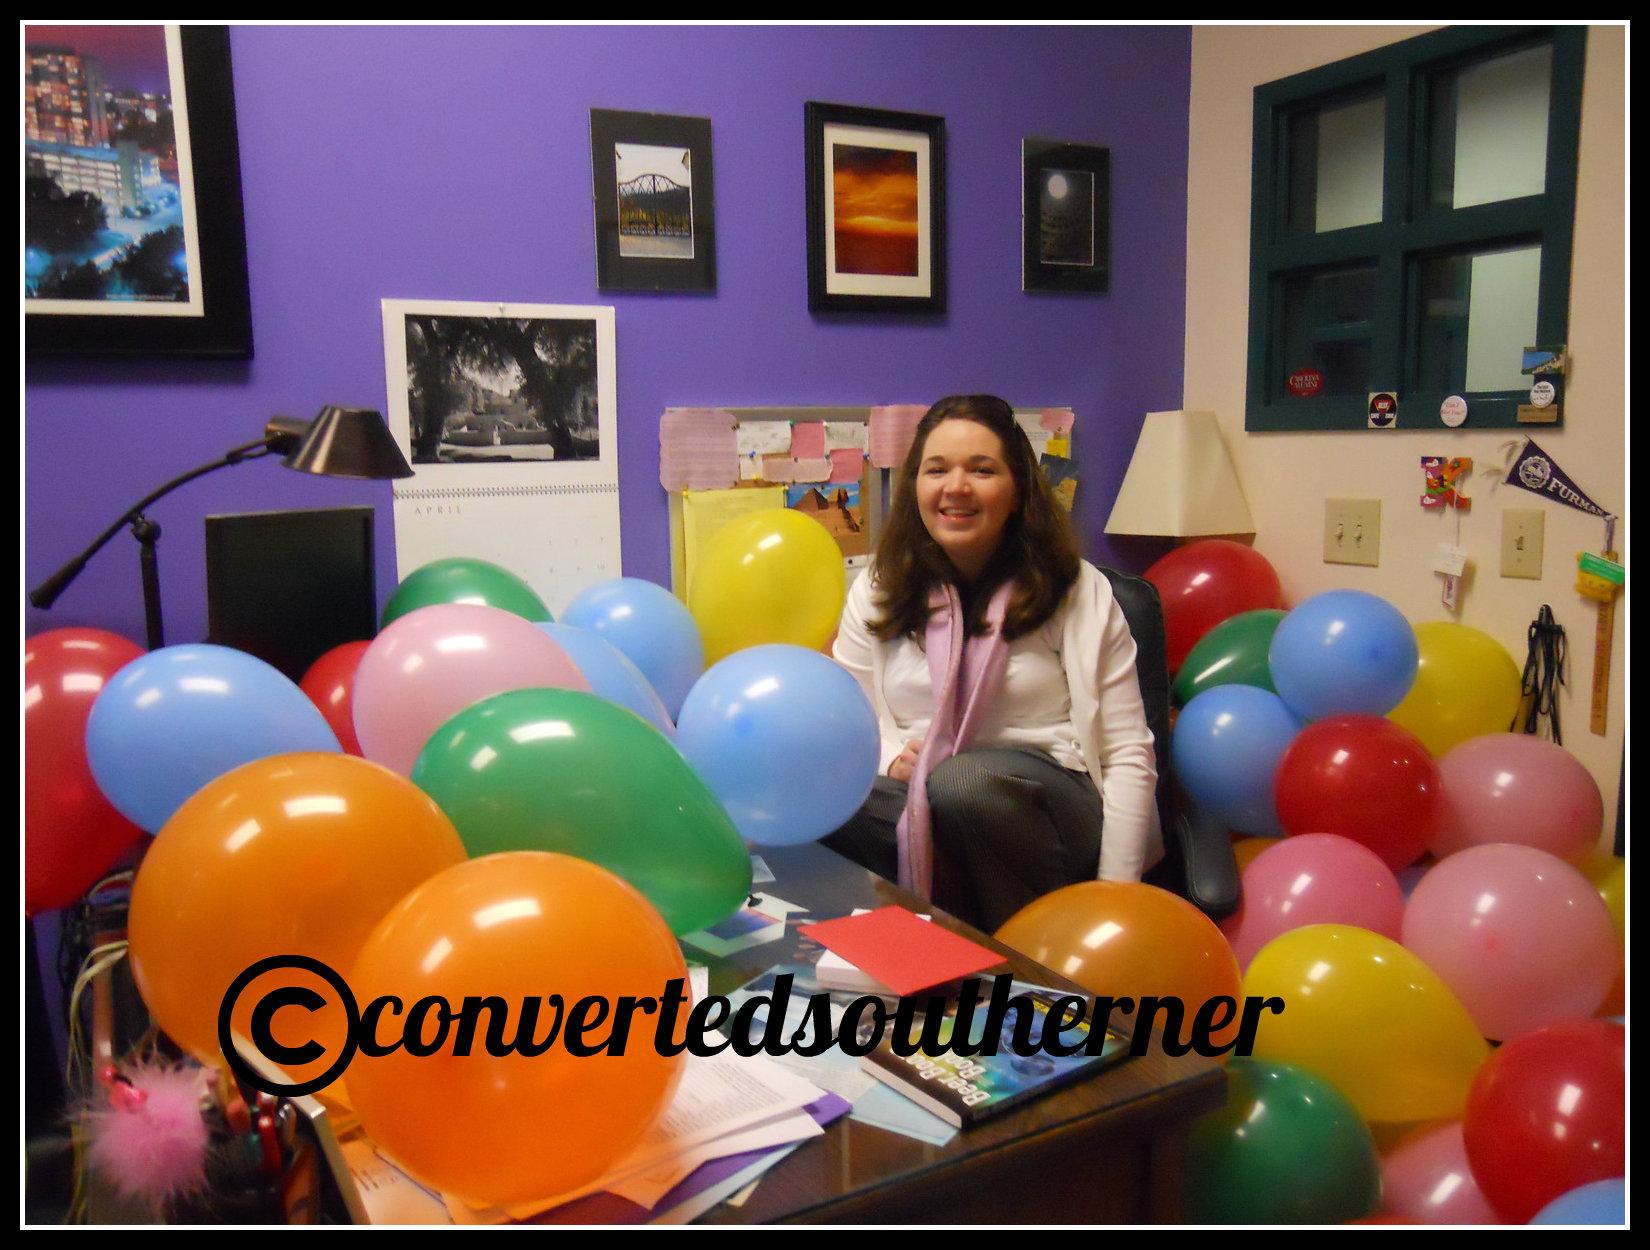 Throwback Thursday: An Office Full of Balloons, April 2010 ...